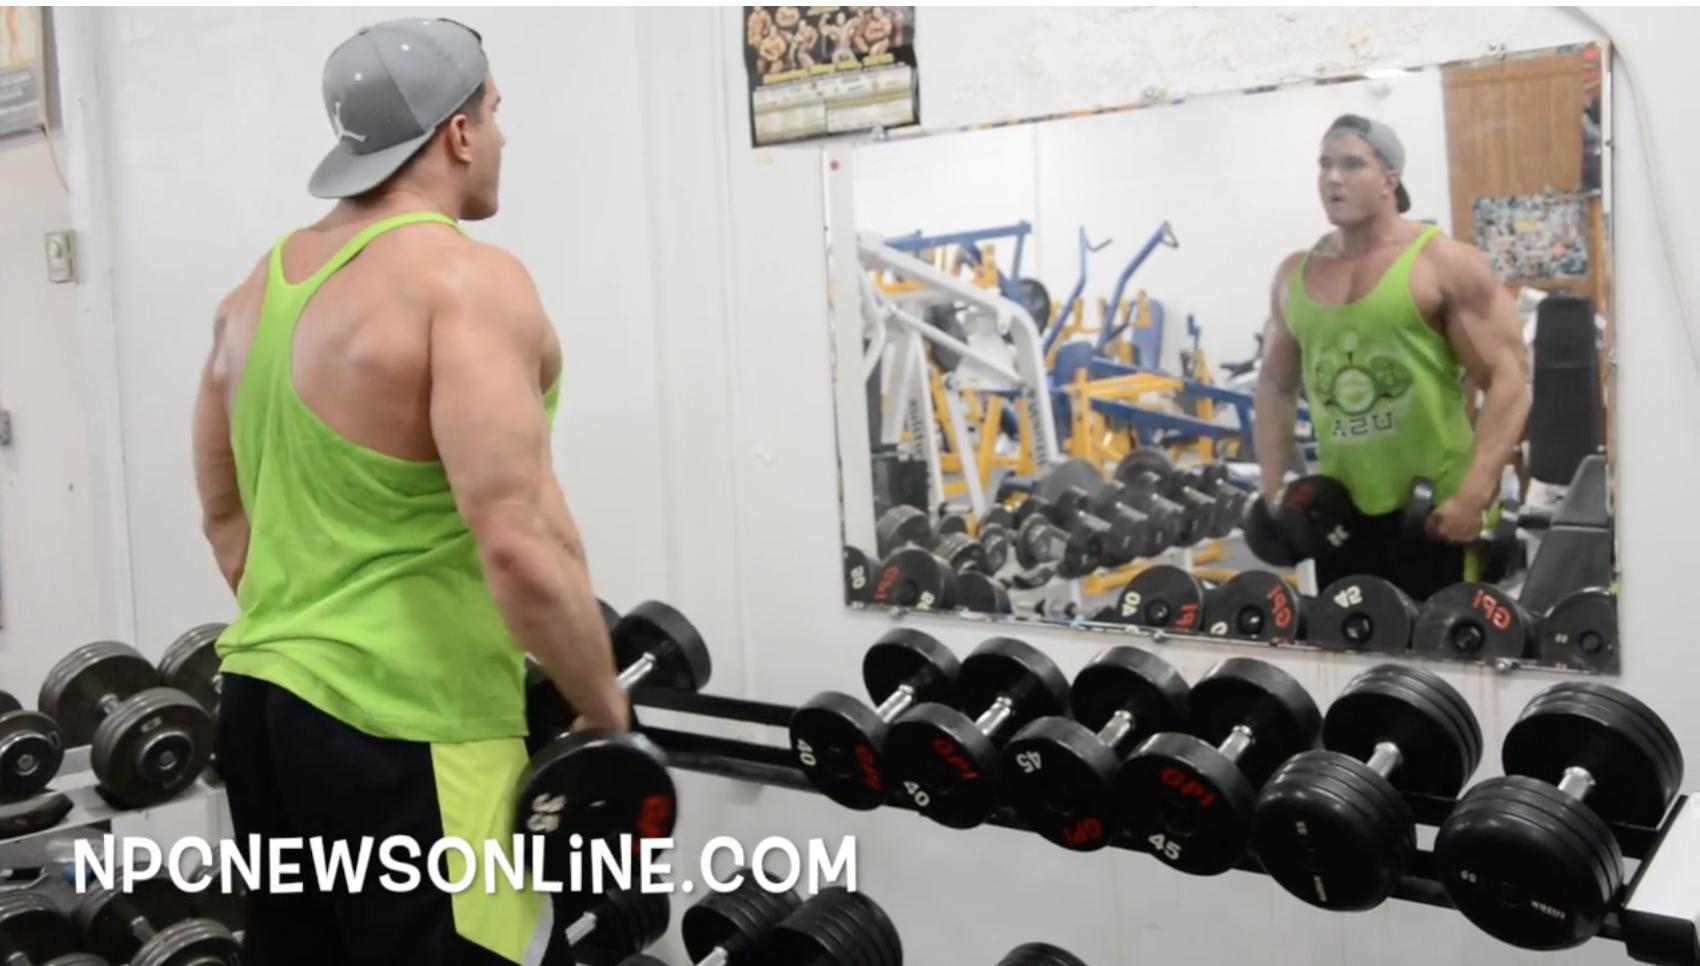 NPC Bodybuilder's Silas Merkel & Eric WoodDelts Workout Video